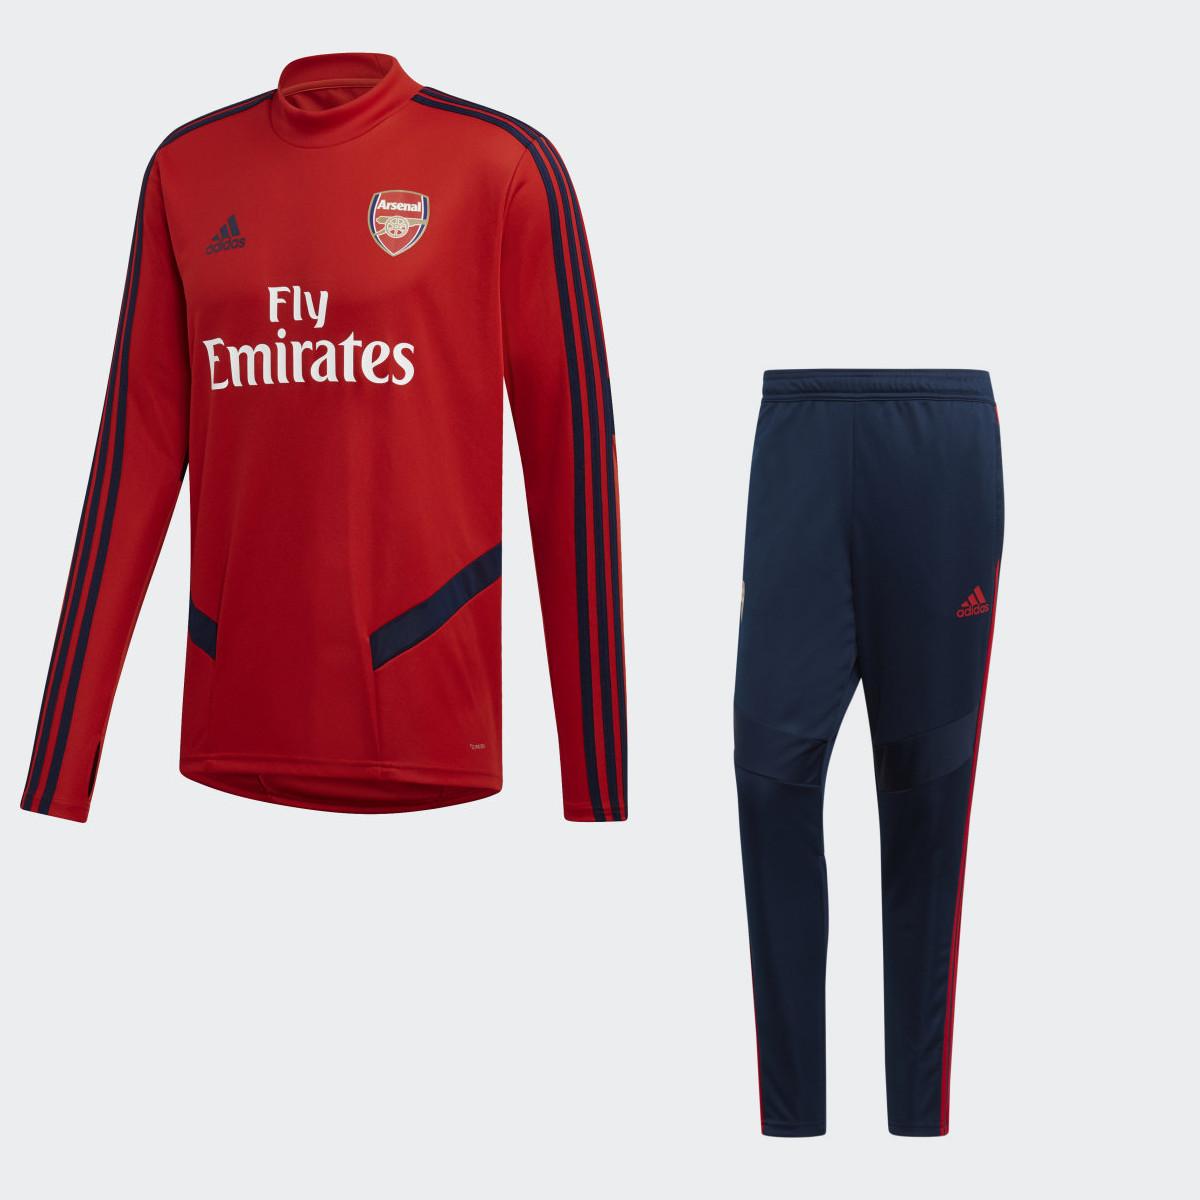 Arsenal Survetement - Maillots-Football.com